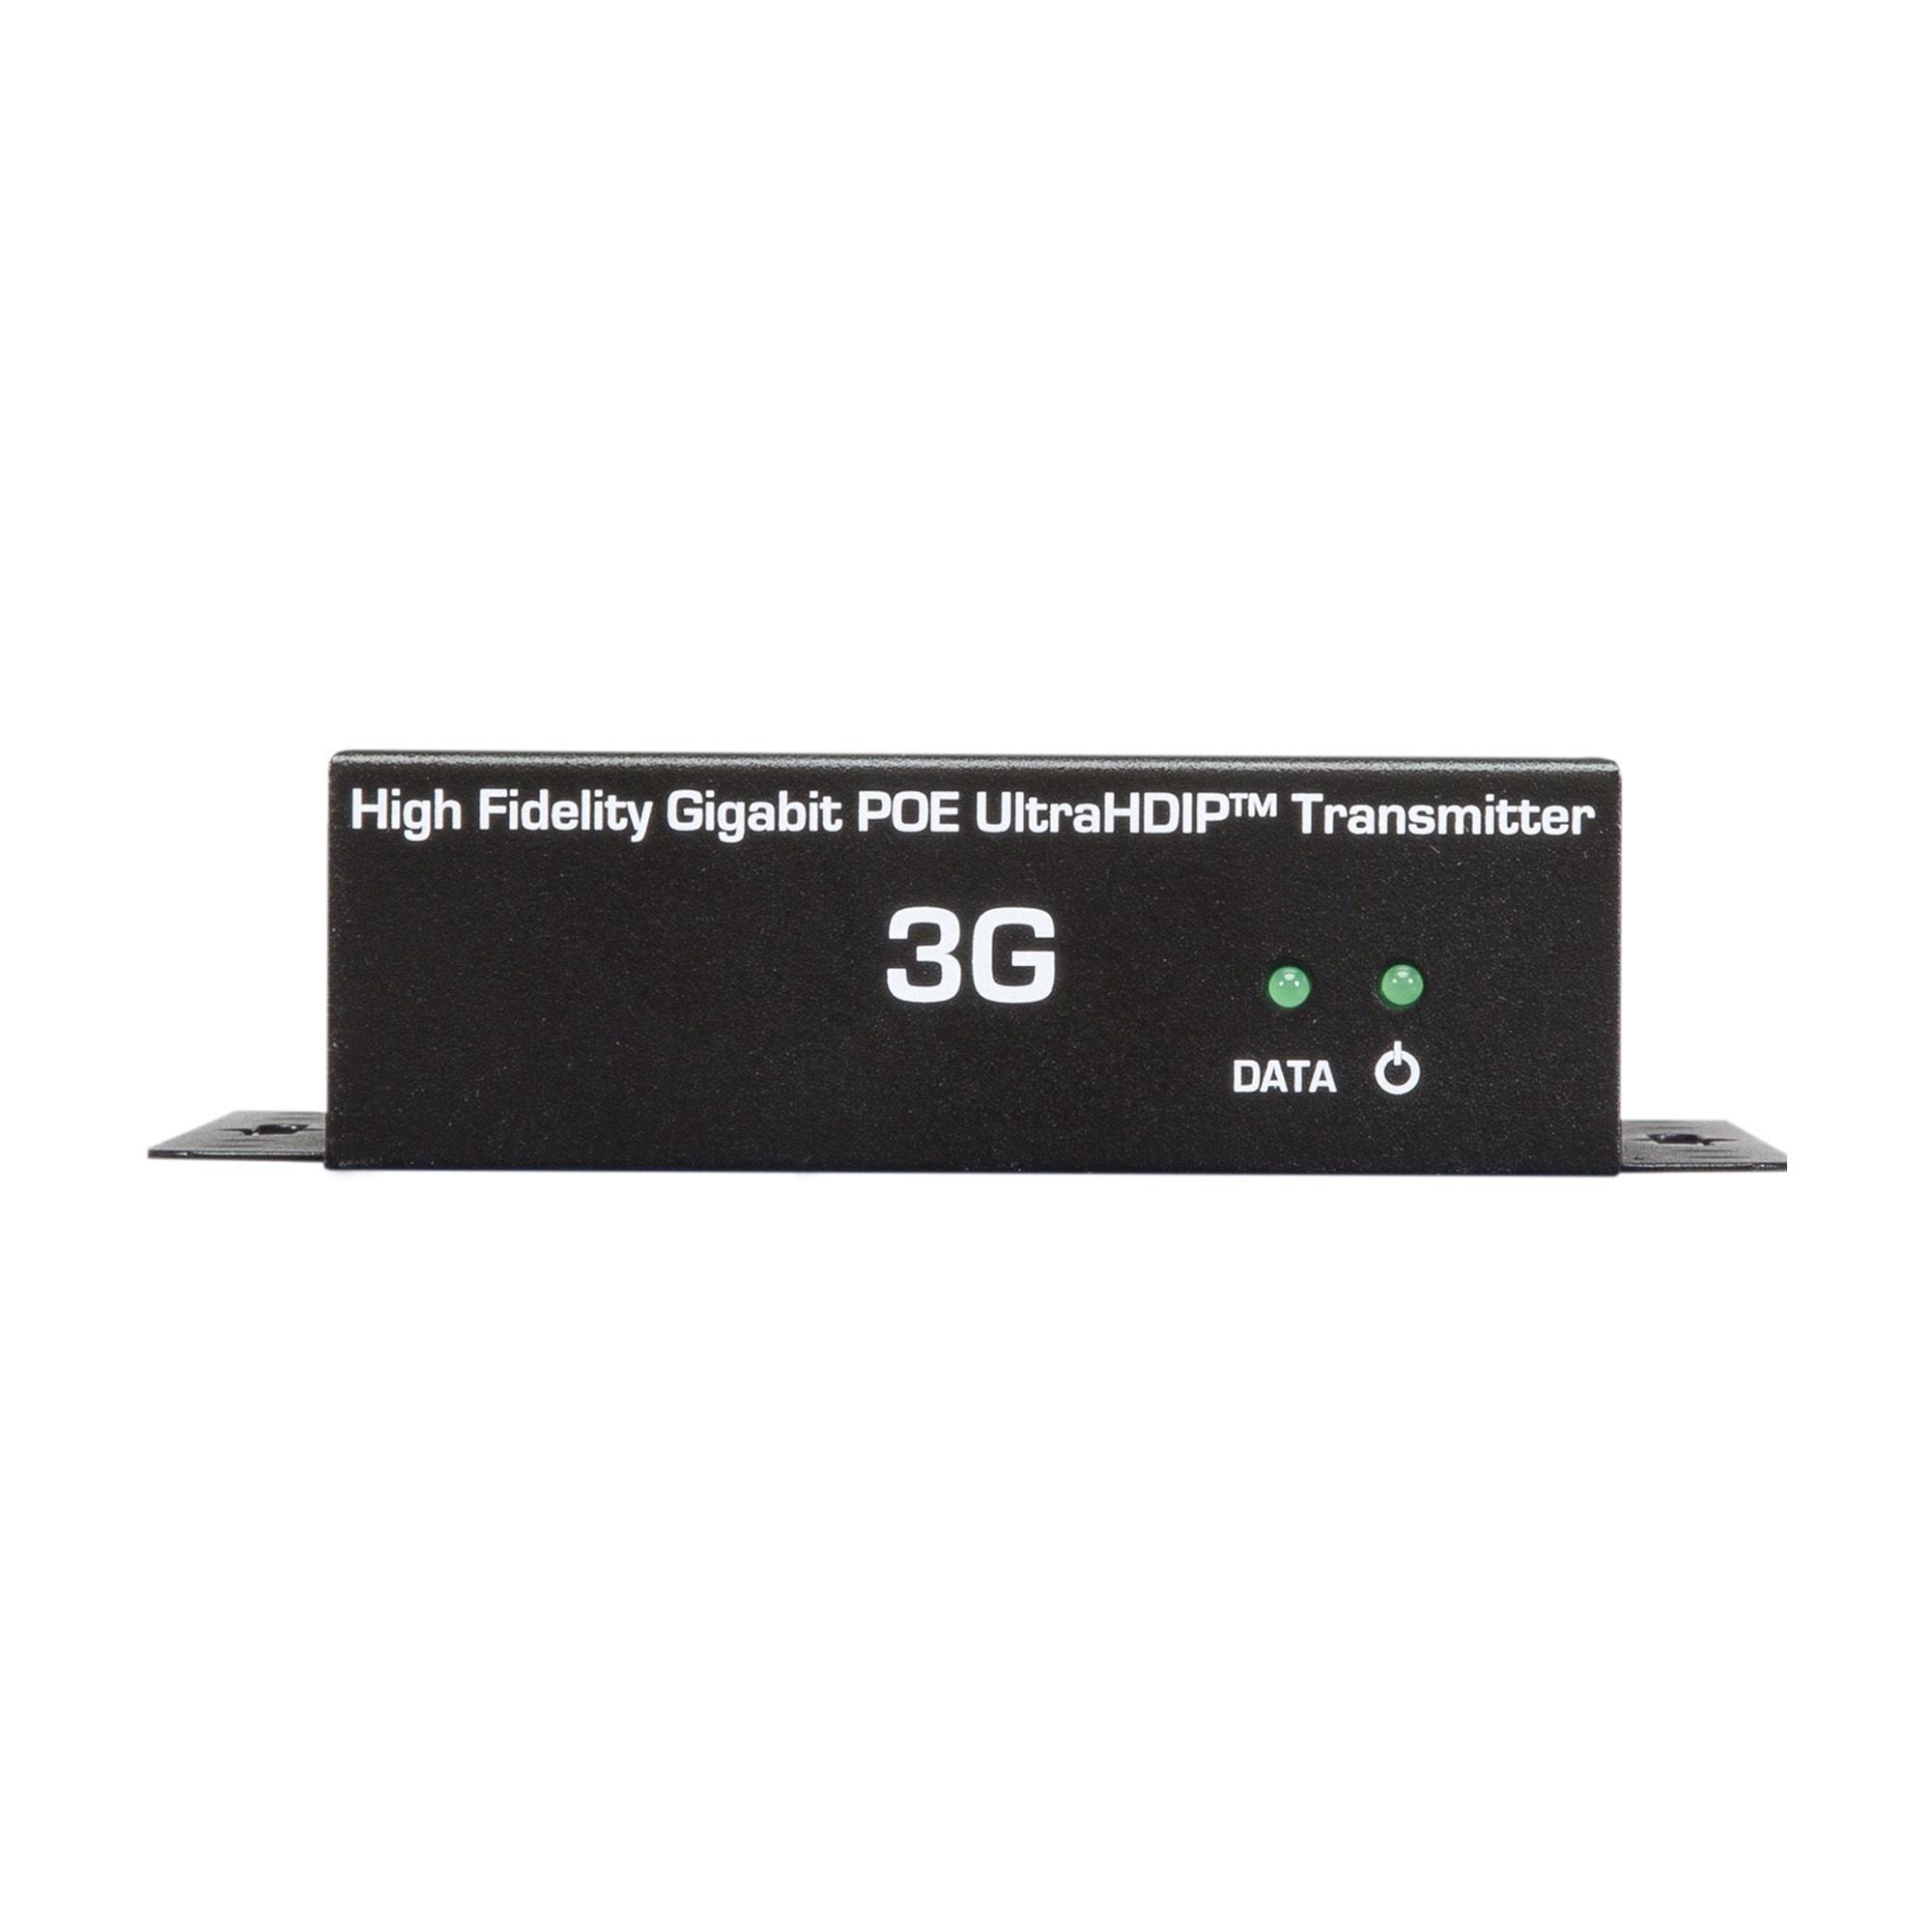 Just Add Power Ultra HD IP Gigabit POE Transmitter, 718POE TX